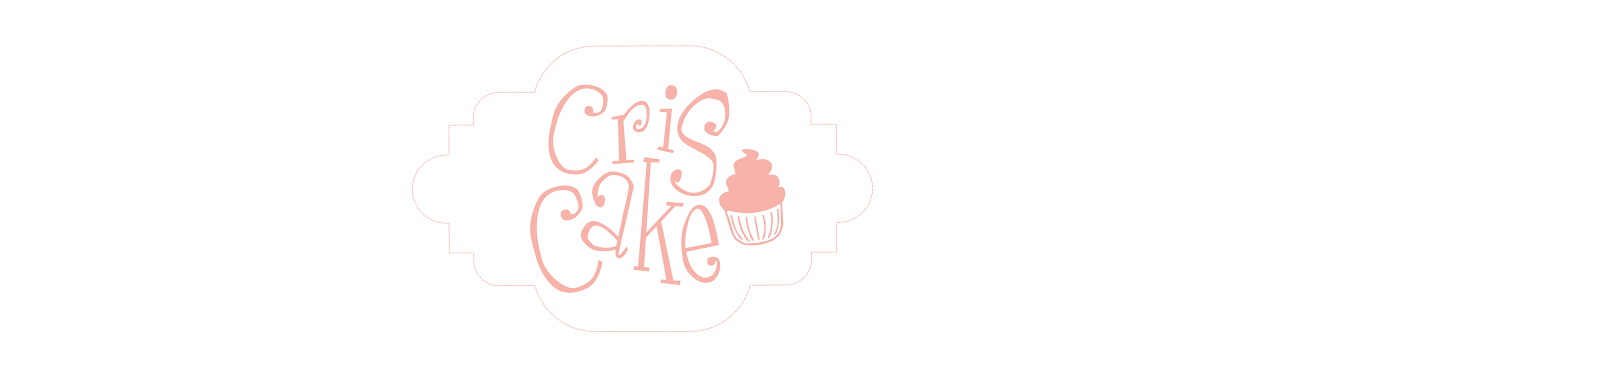 cris cake